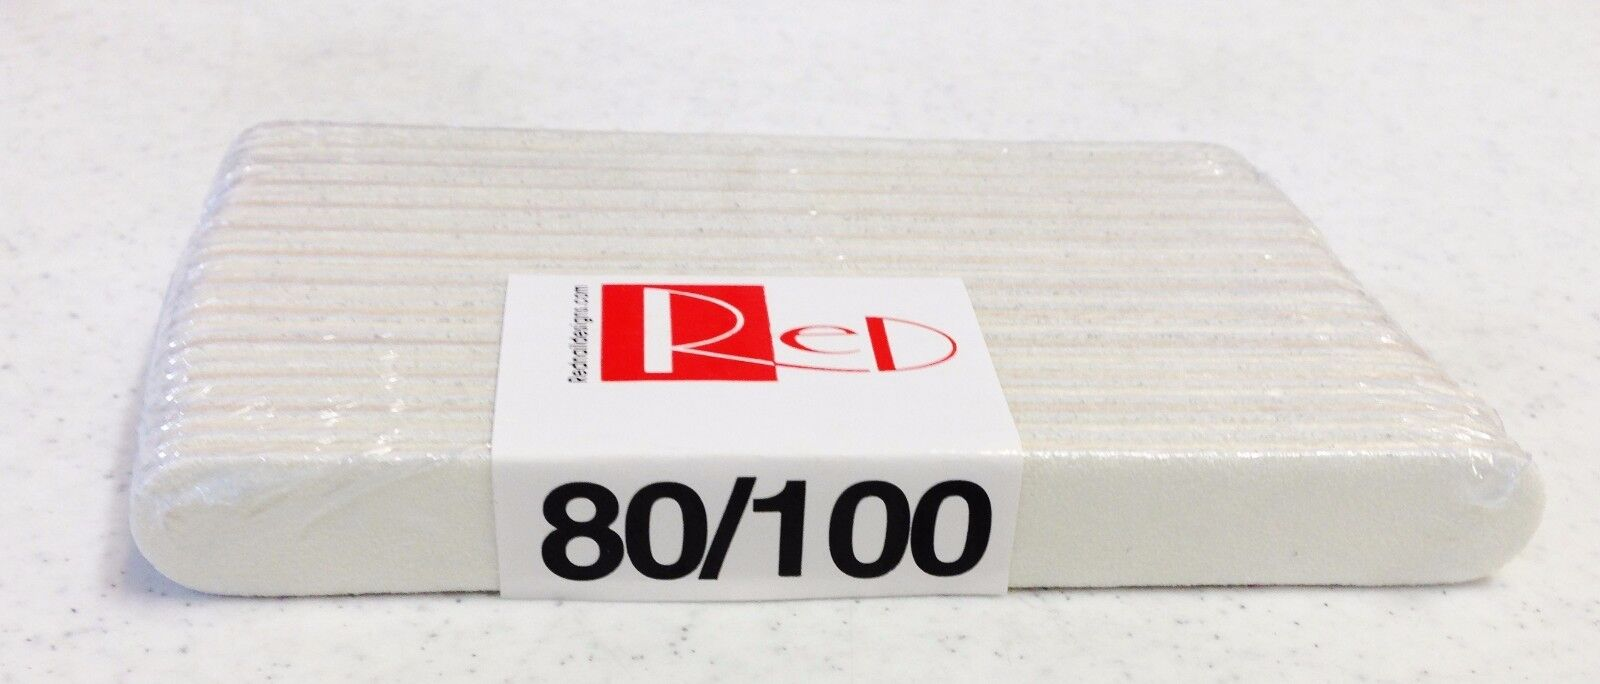 RED Nail Designs Emery Board Natural Nail File White 5 inche